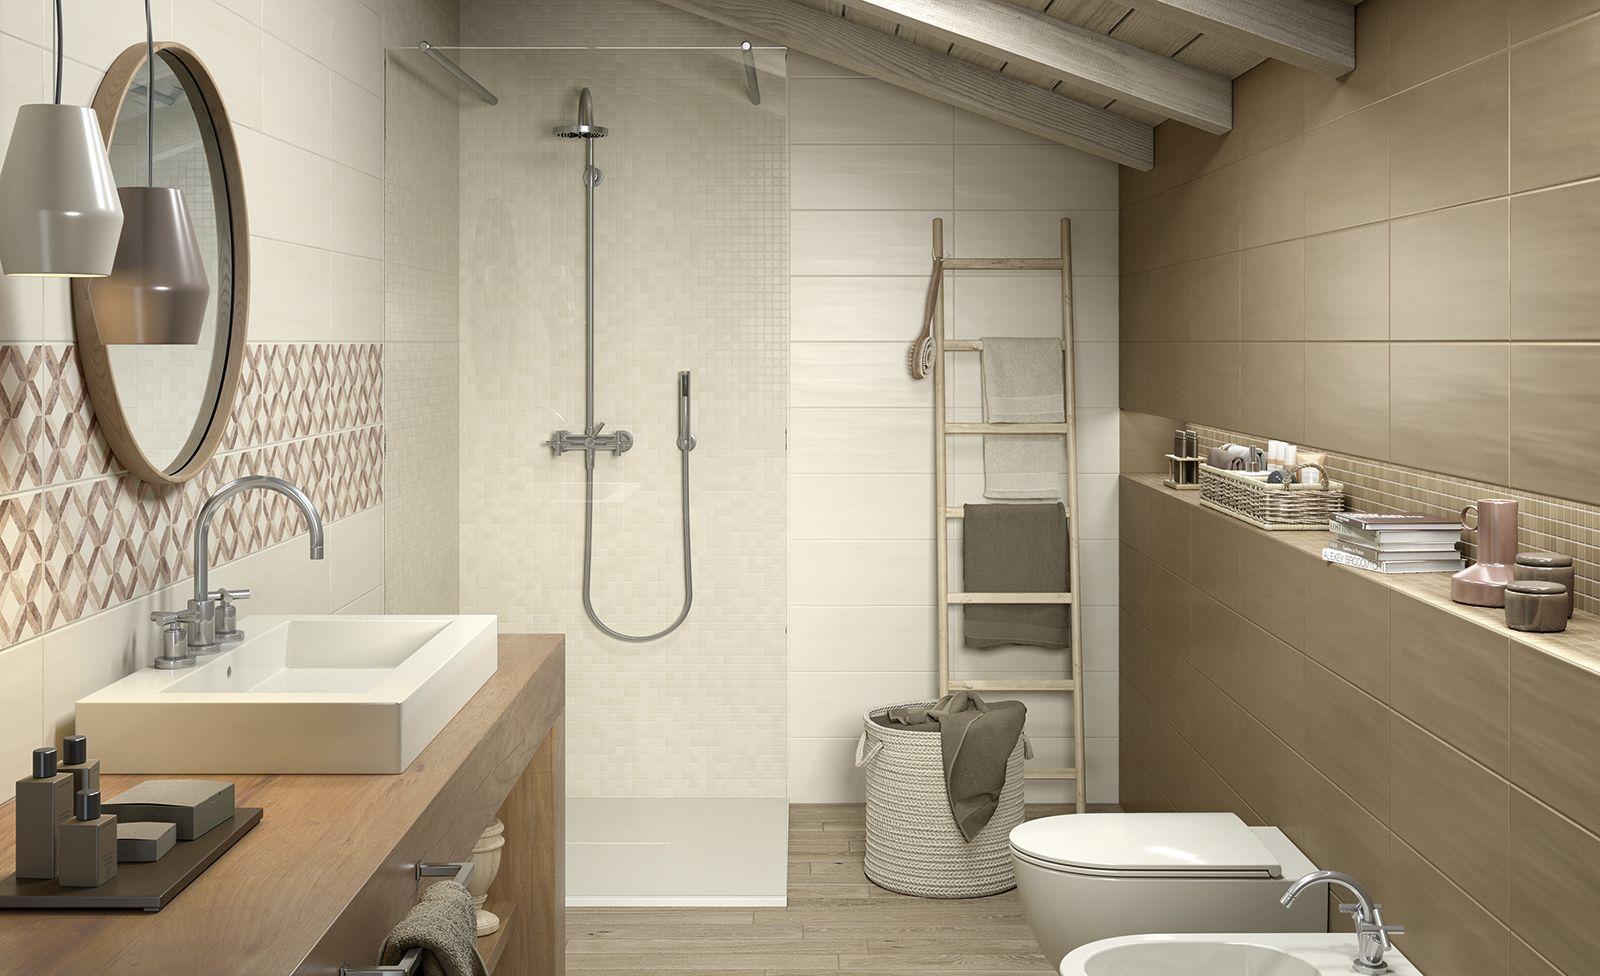 Paint ceramic tiles marazzi 7070 bathroom pinterest bagno